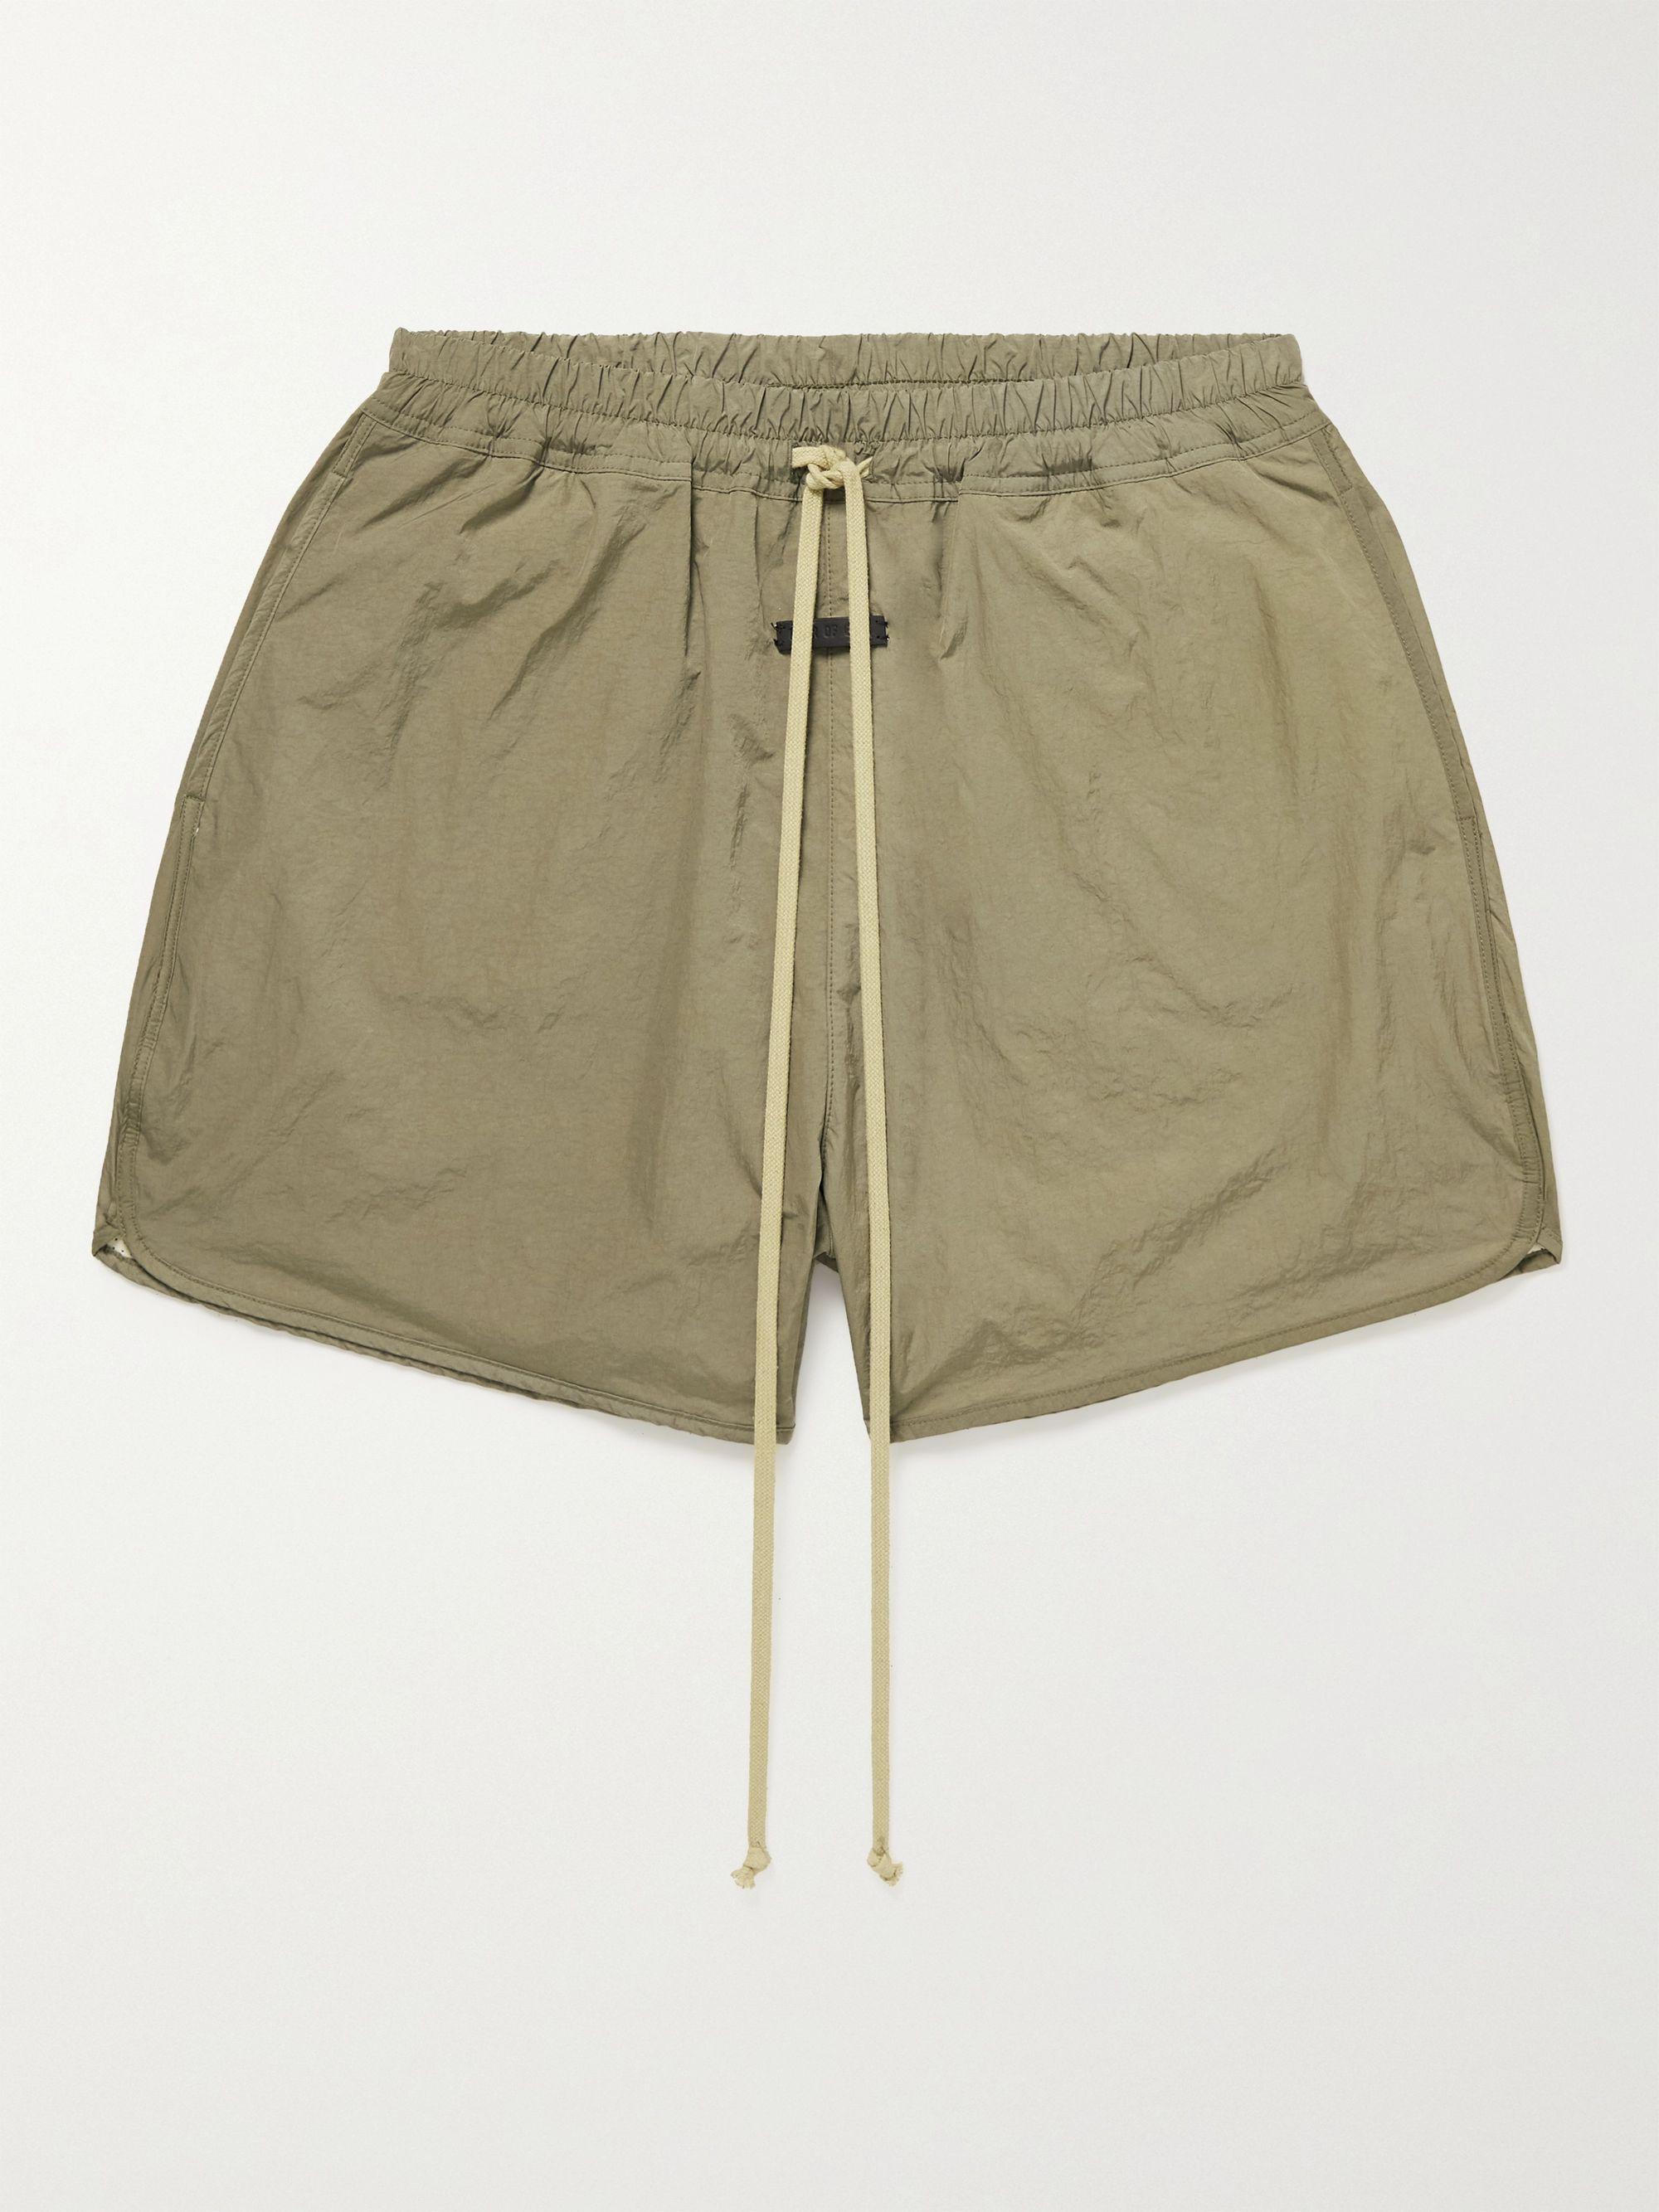 Fear of God Wide-Leg Logo-Appliqued Nylon Drawstring Shorts,Taupe